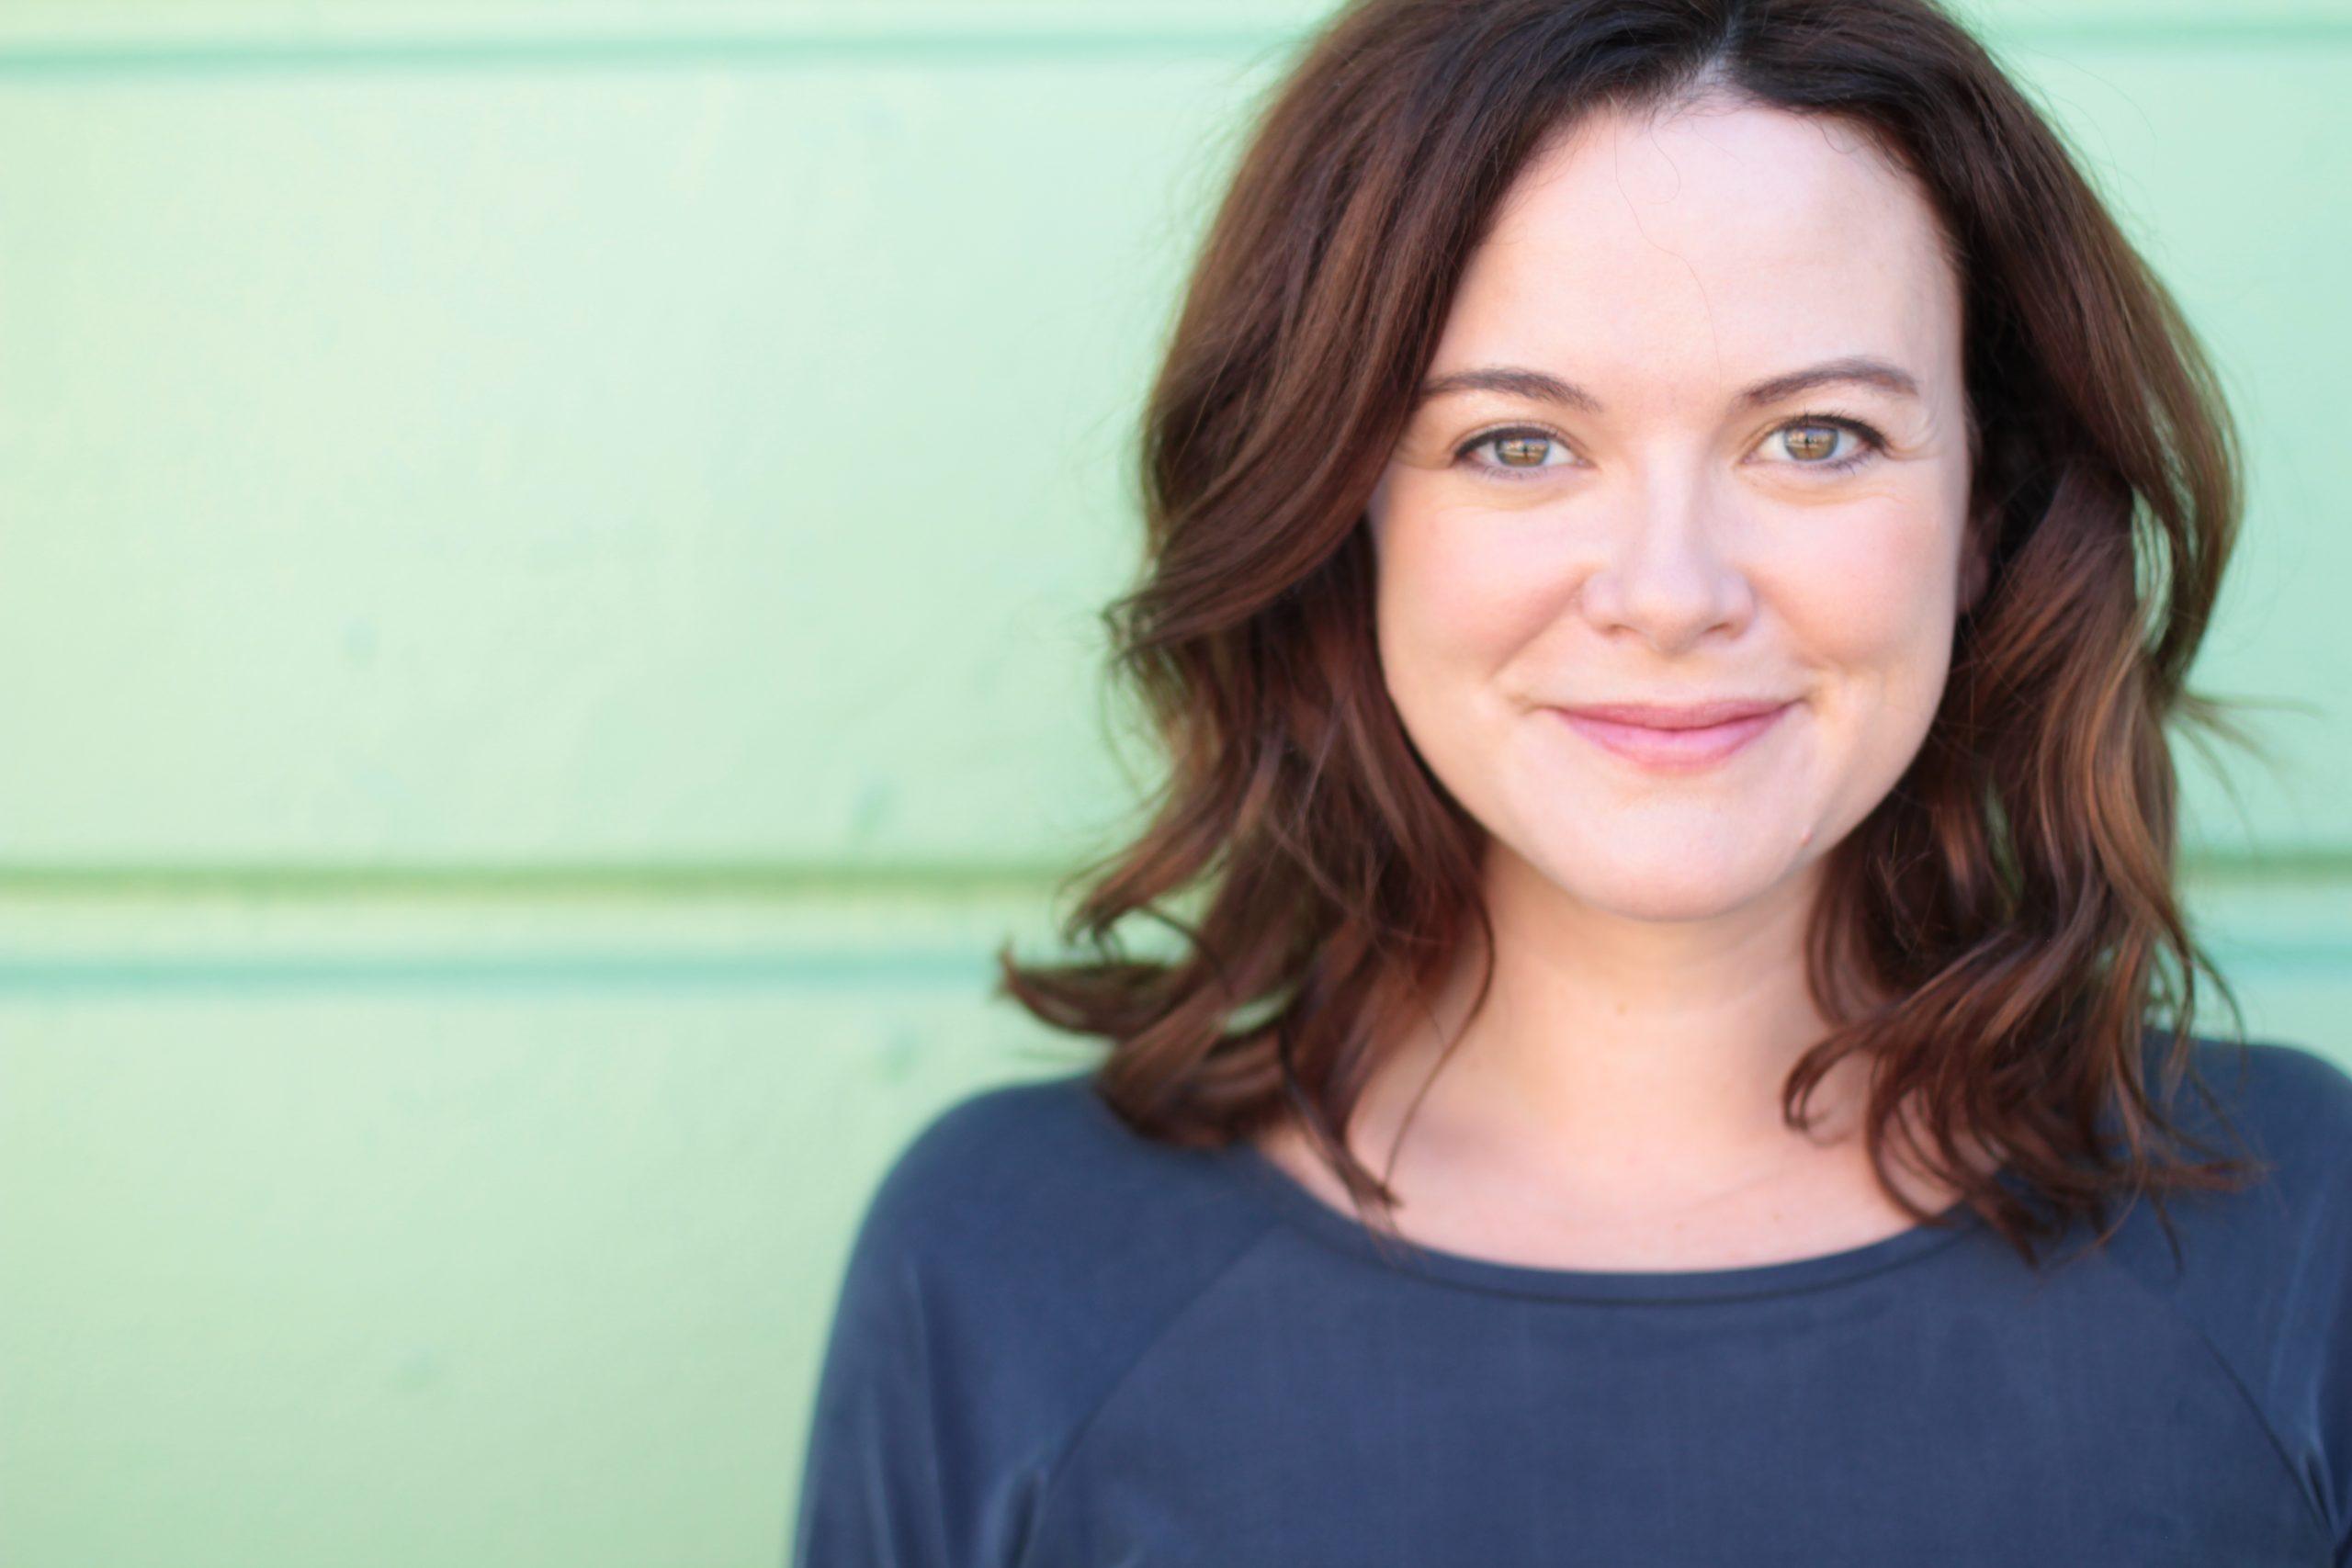 Volunteer Highlight: Mary-Kate Schellhardt